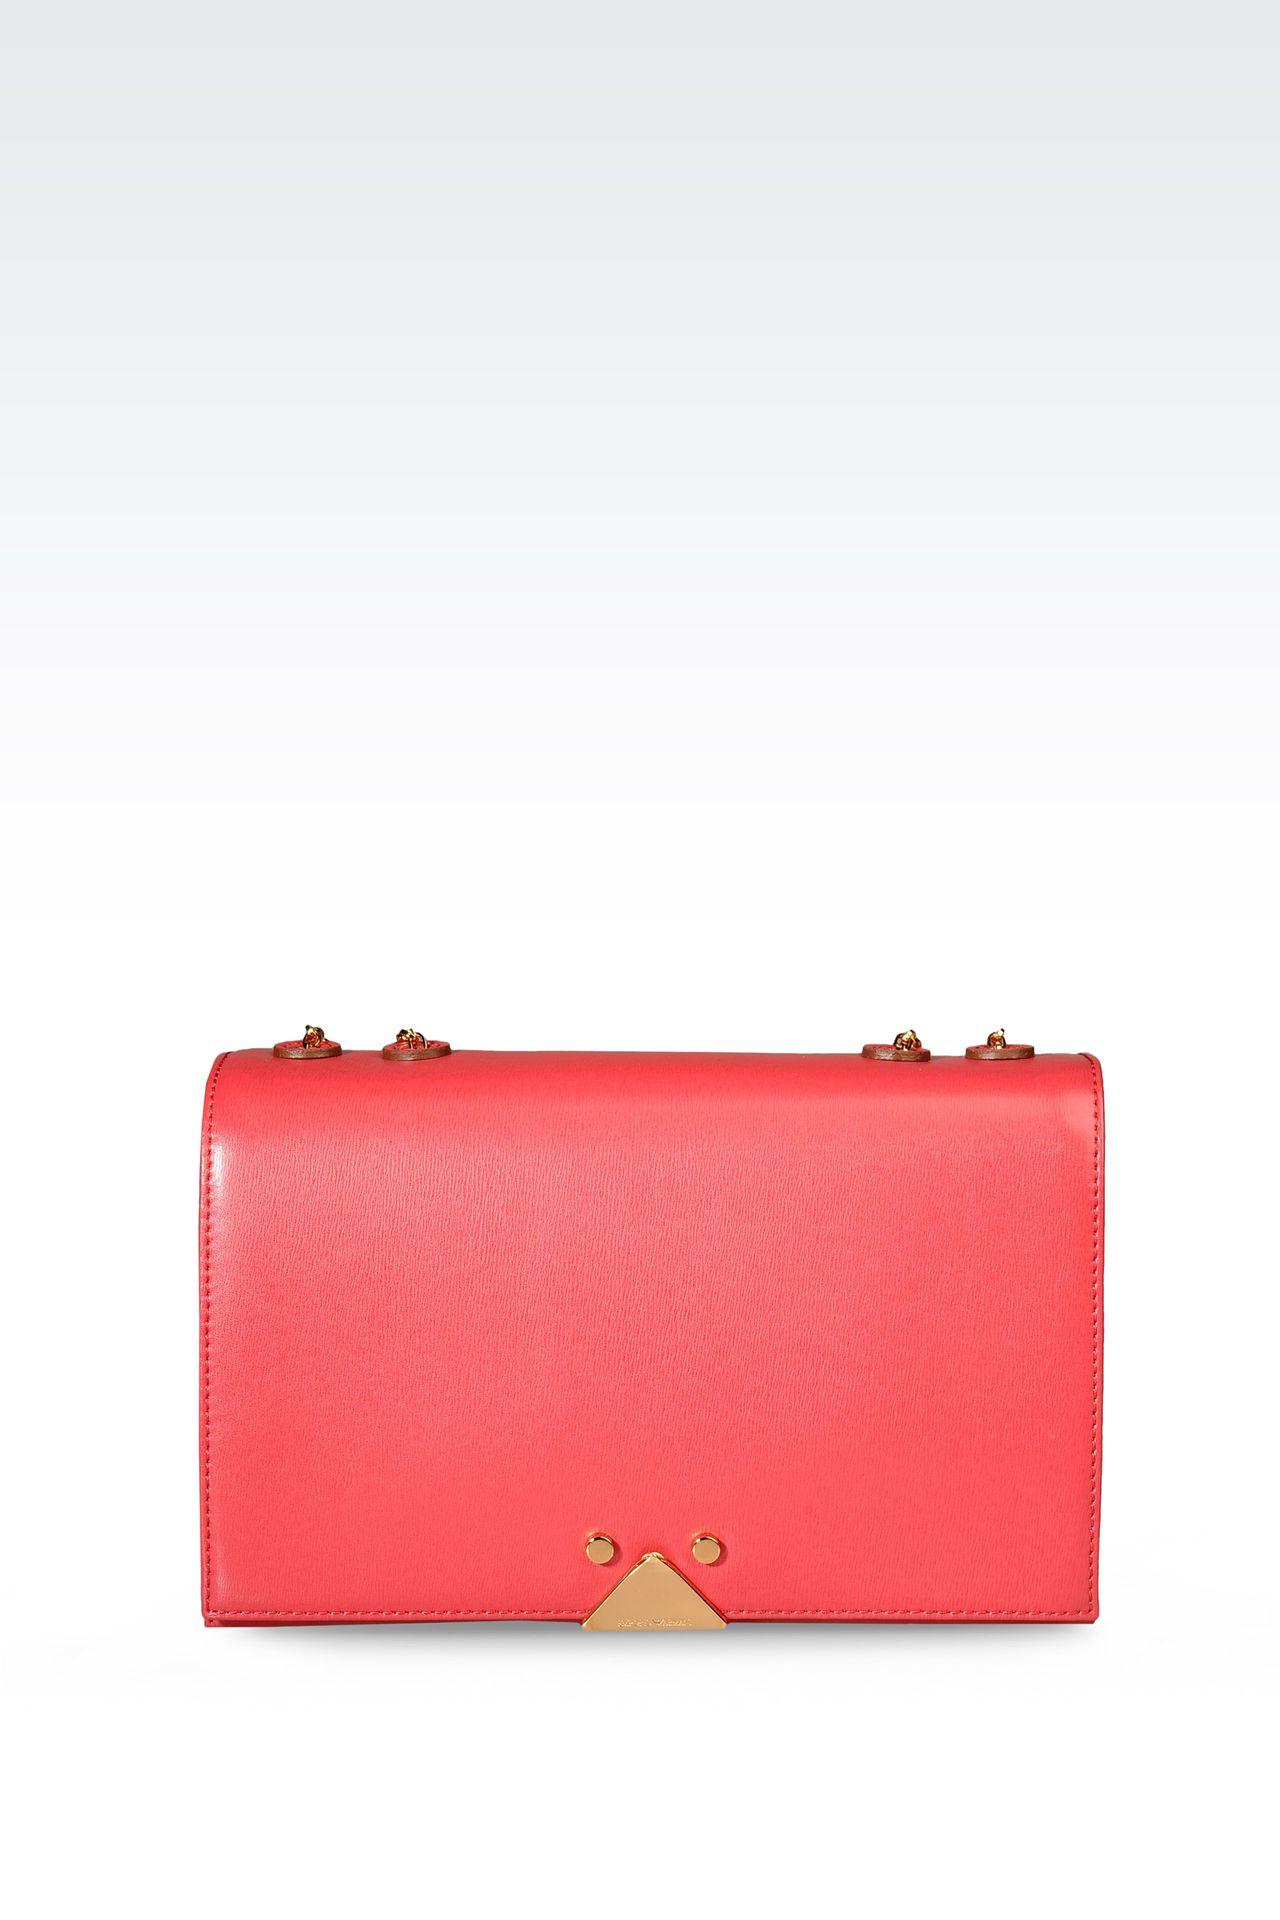 Emporio Armani Women Shoulder Bag - LEATHER BAG WITH CHAIN SHOULDER STRAP Emporio Armani Official Online Store